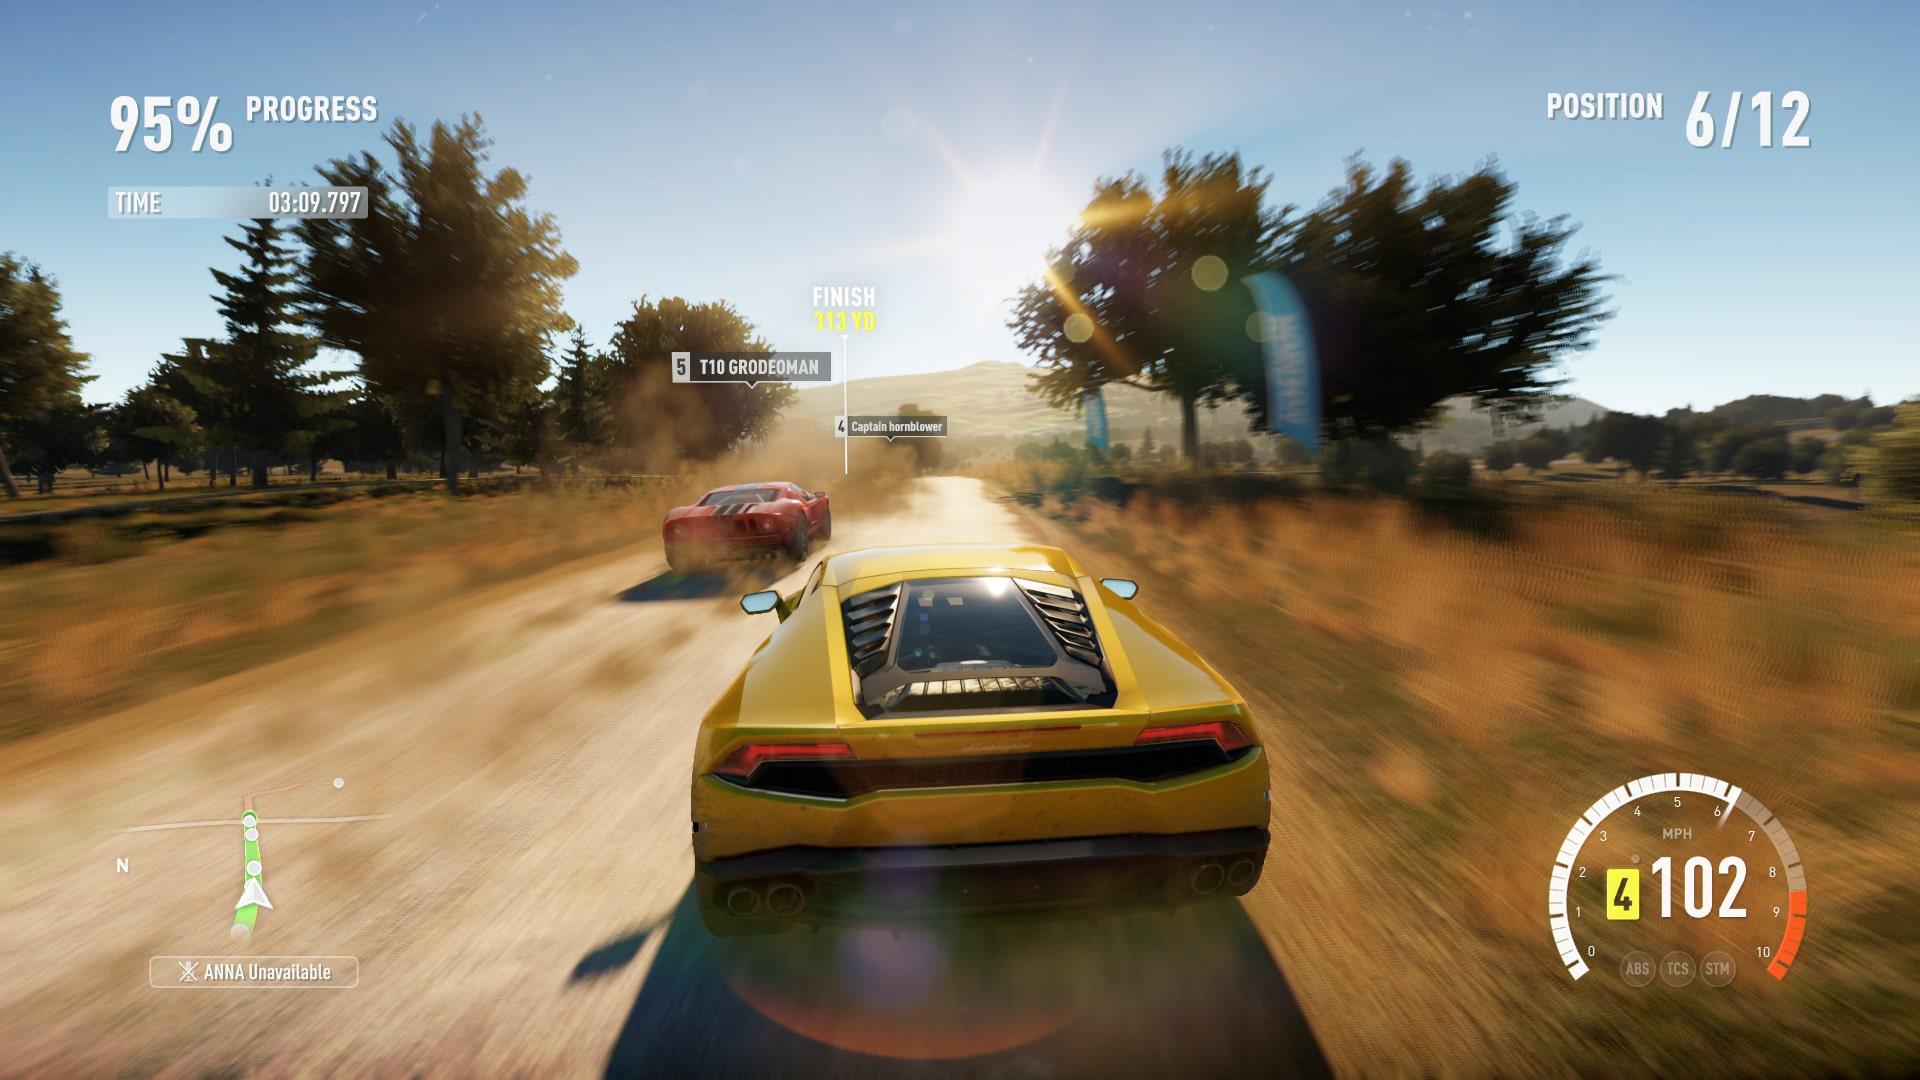 'Forza Horizon 2' review - turning the corner?